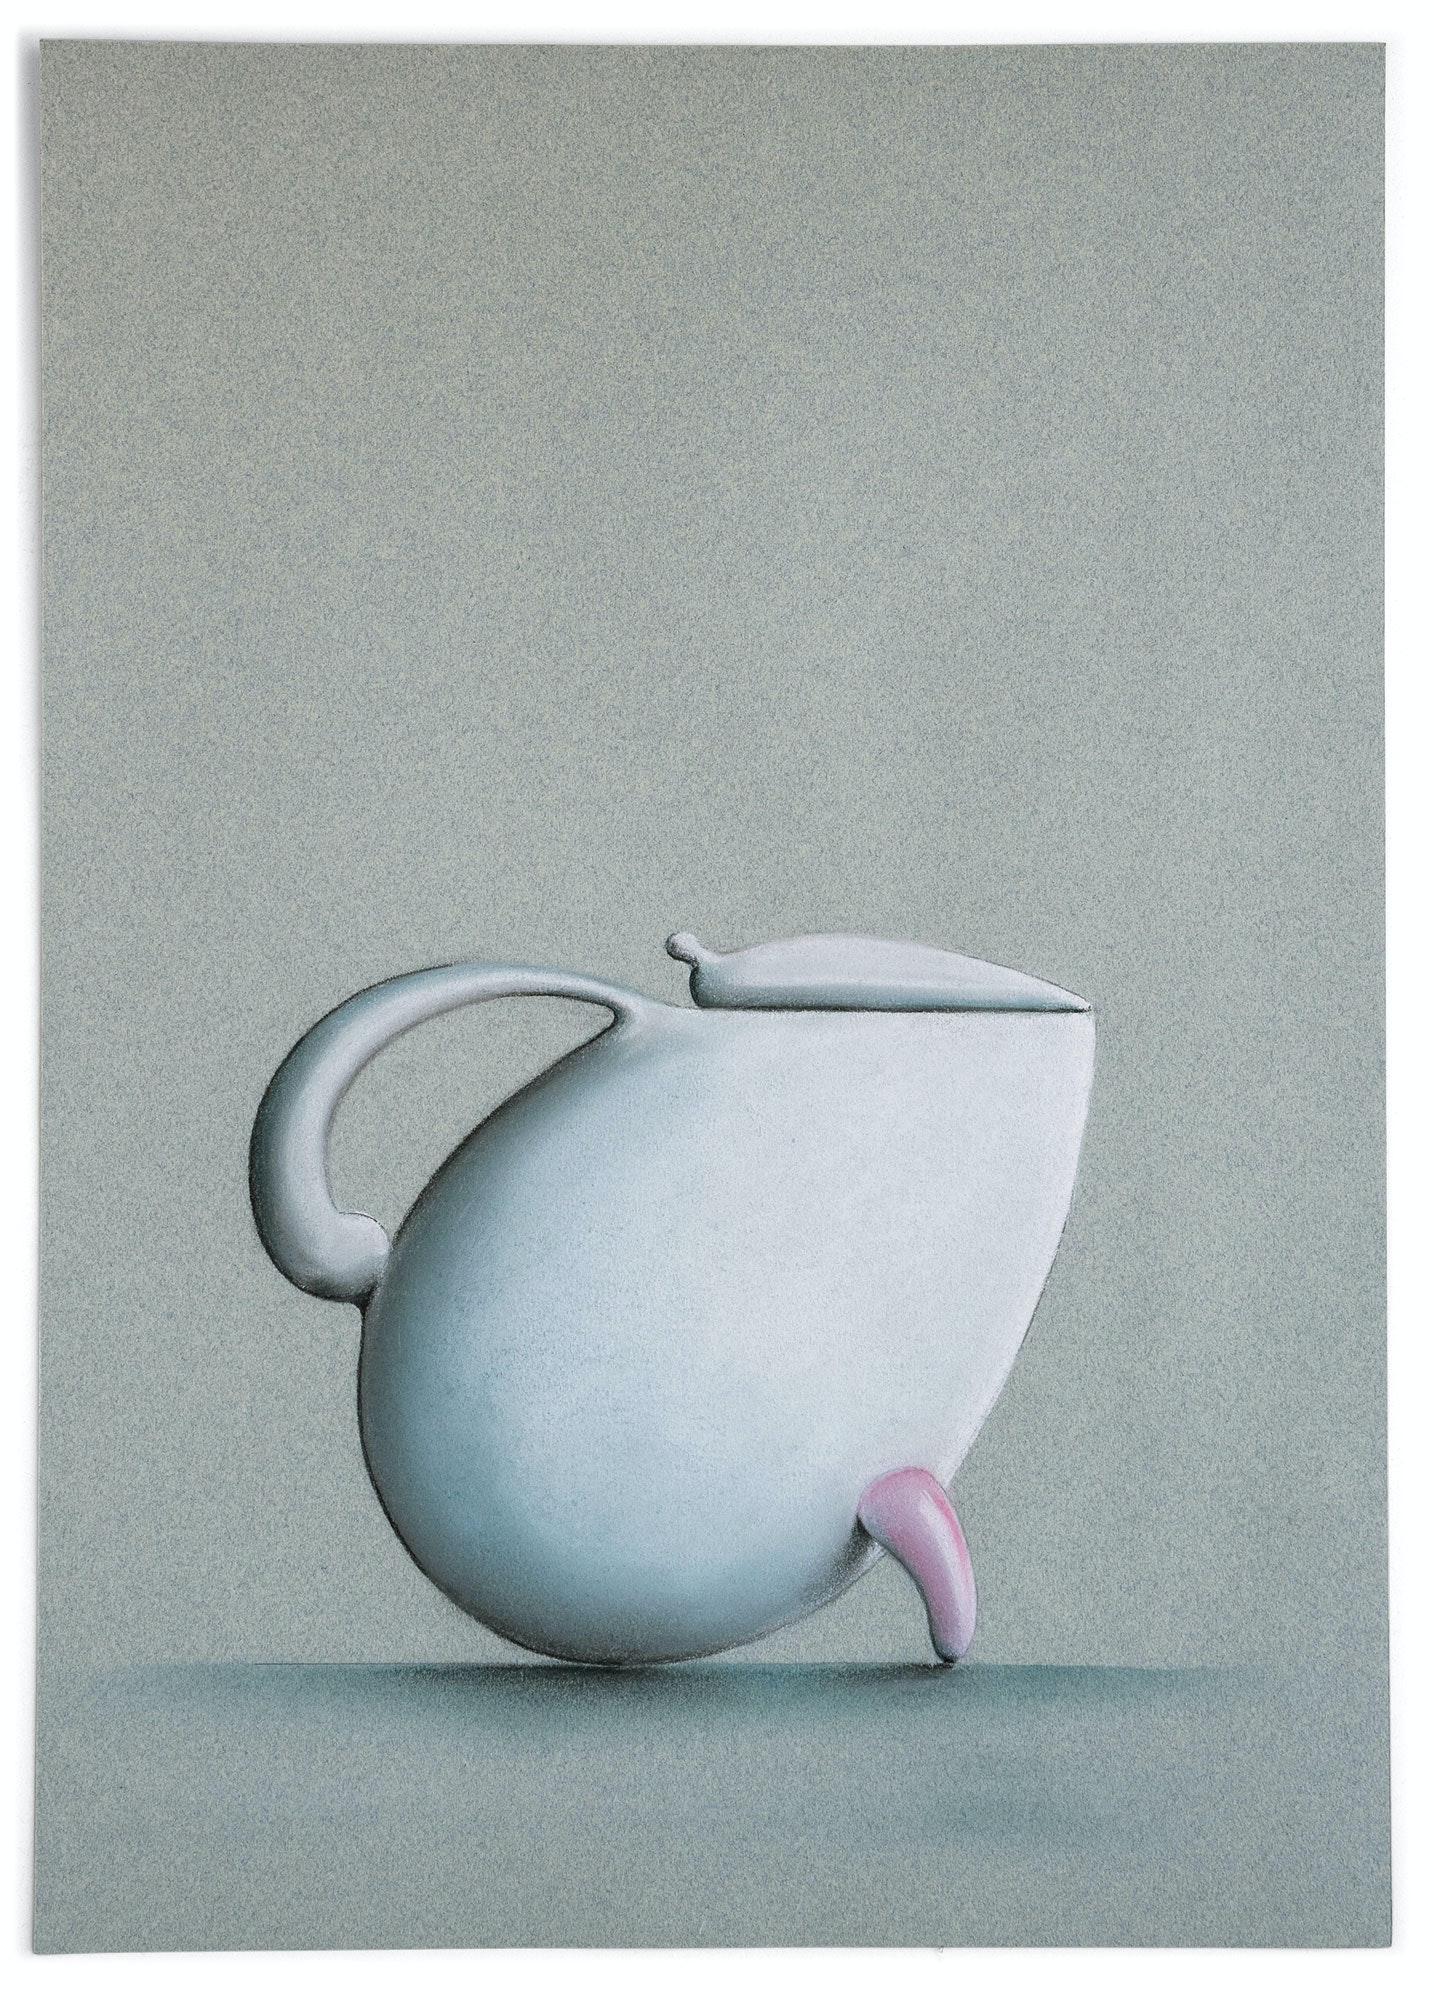 Michael Loos - CeramicTeaPot_DSC8961